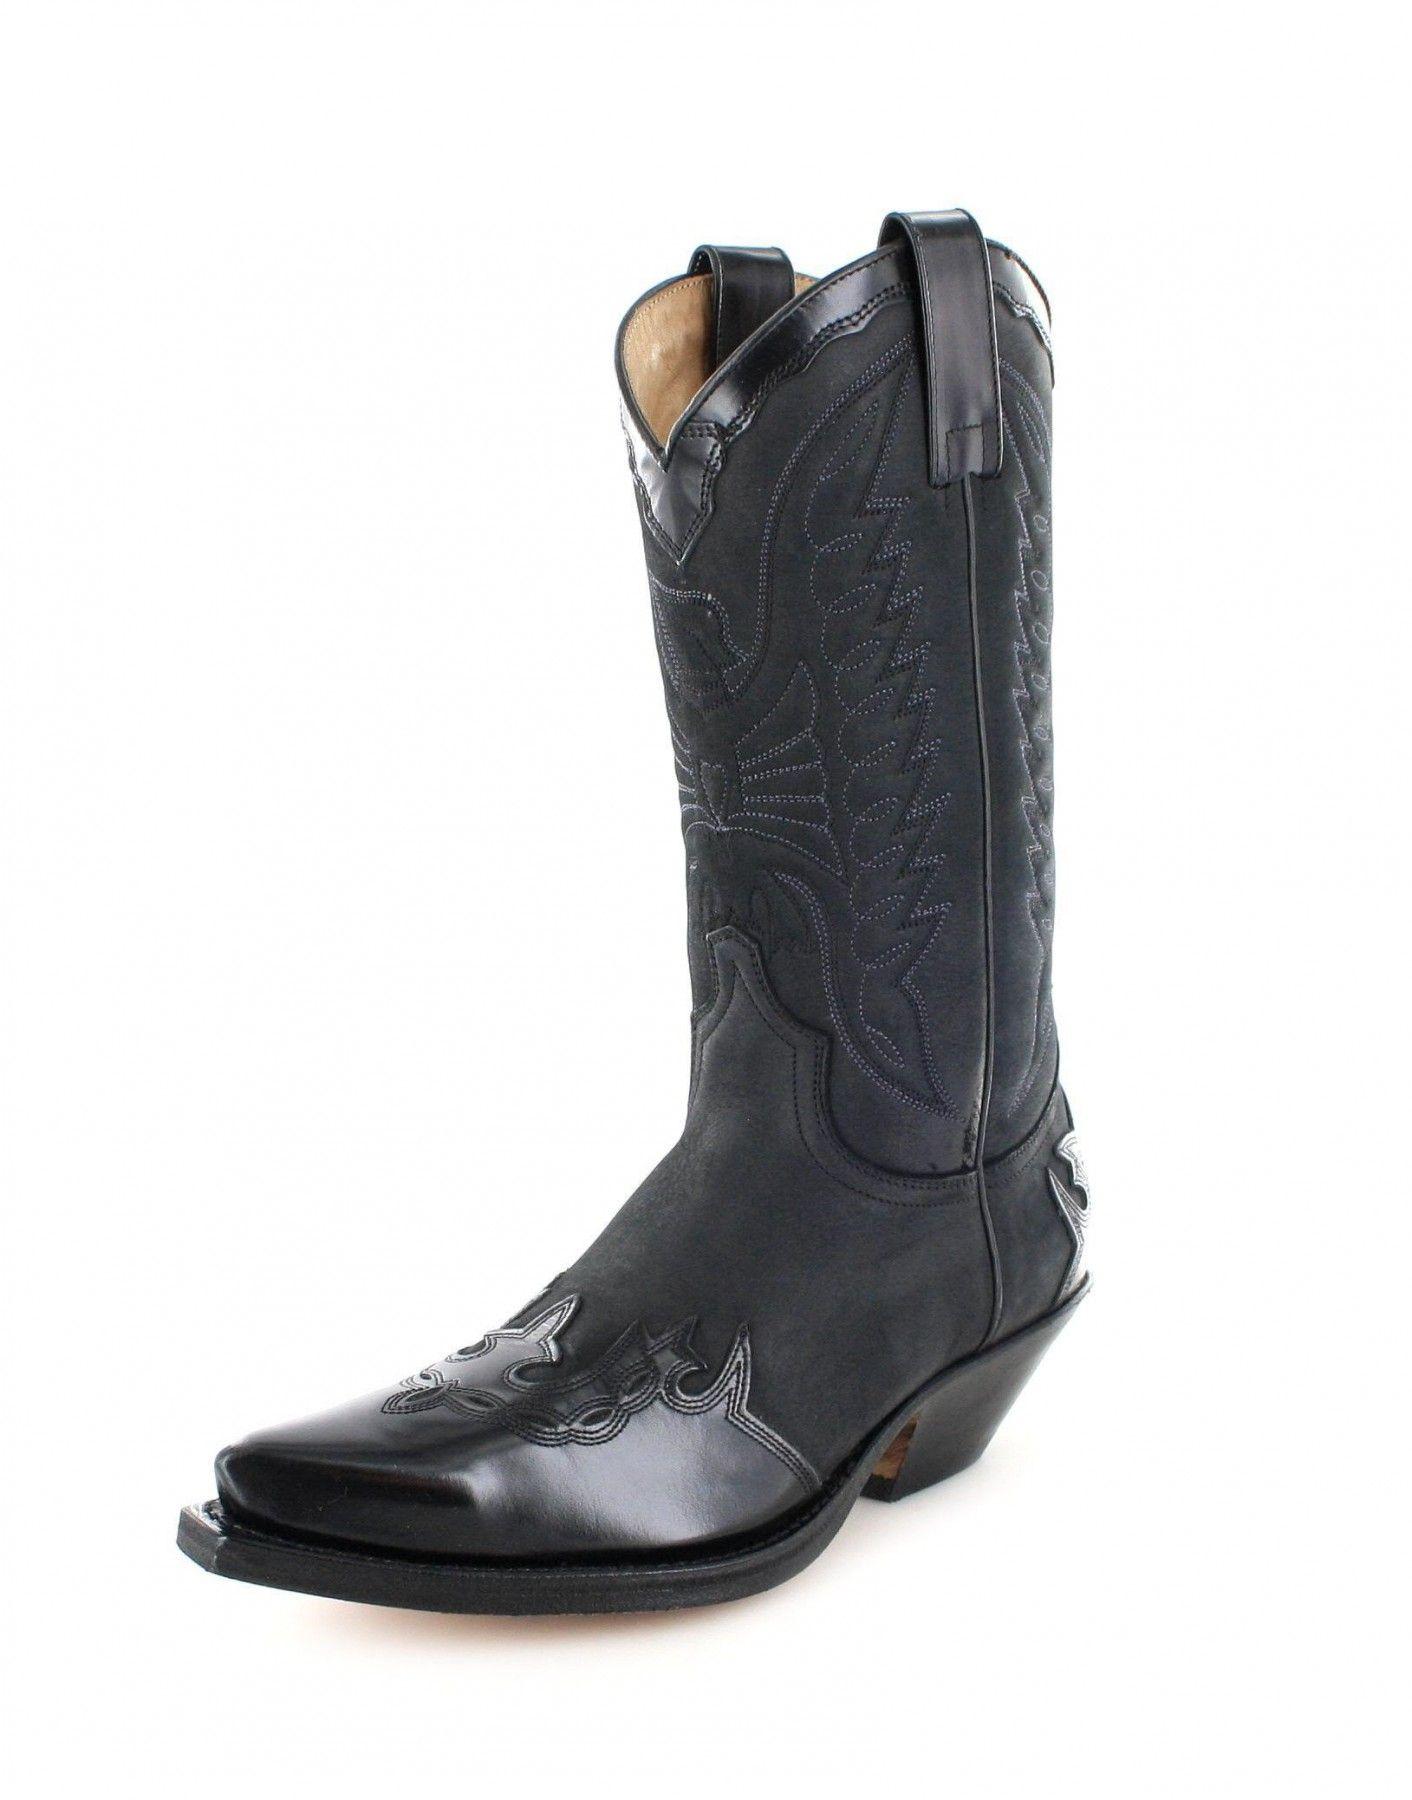 Sendra Boots Stiefel 2560 Schwarz Westernstiefel Cowboystiefel